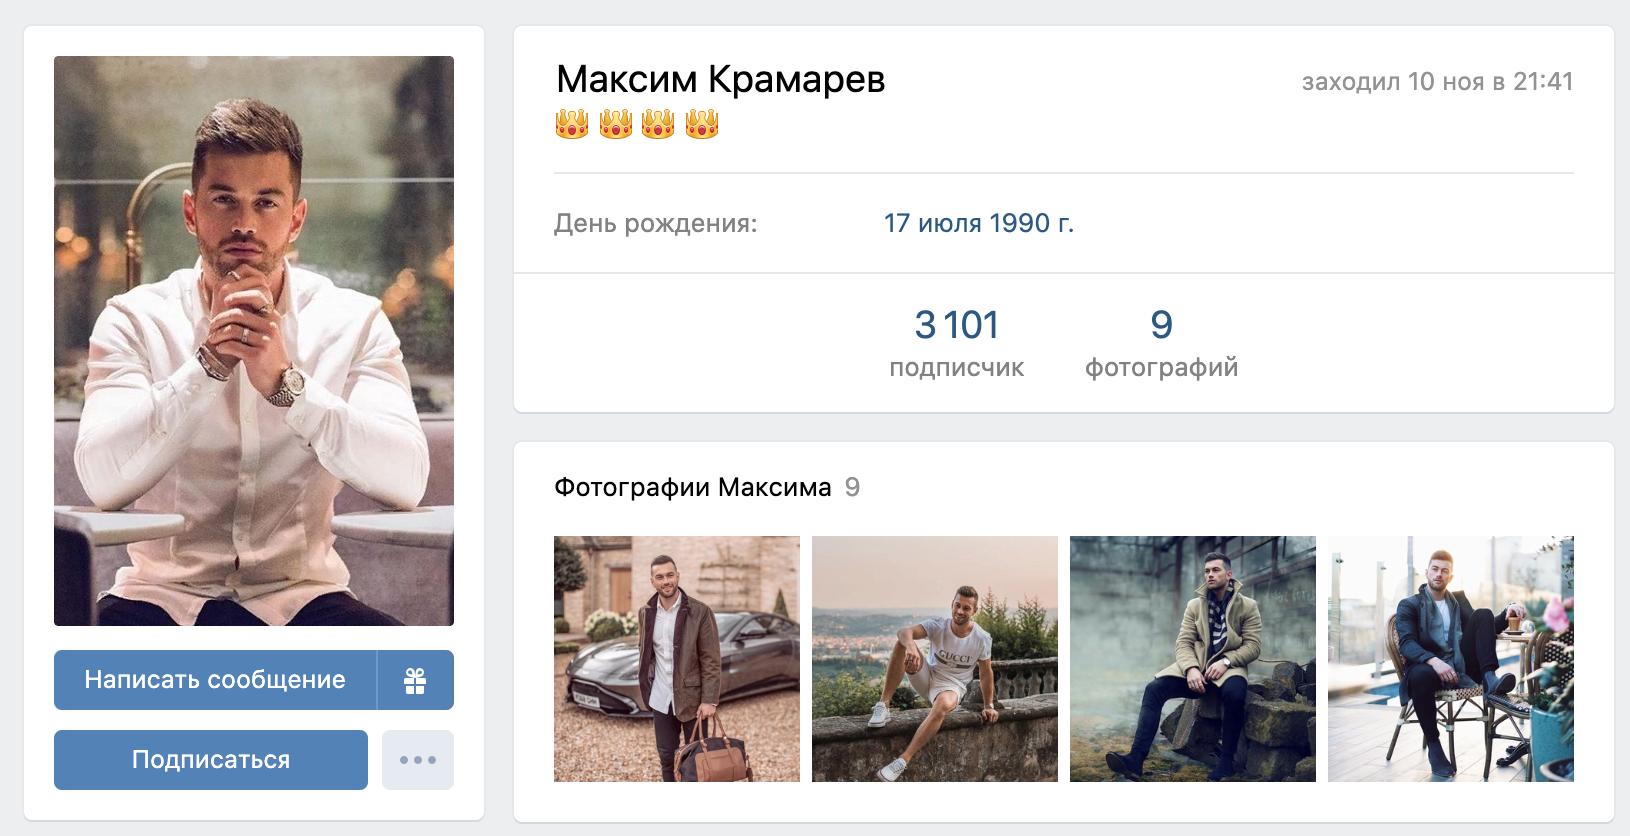 Страница ВК Максима Крамарева